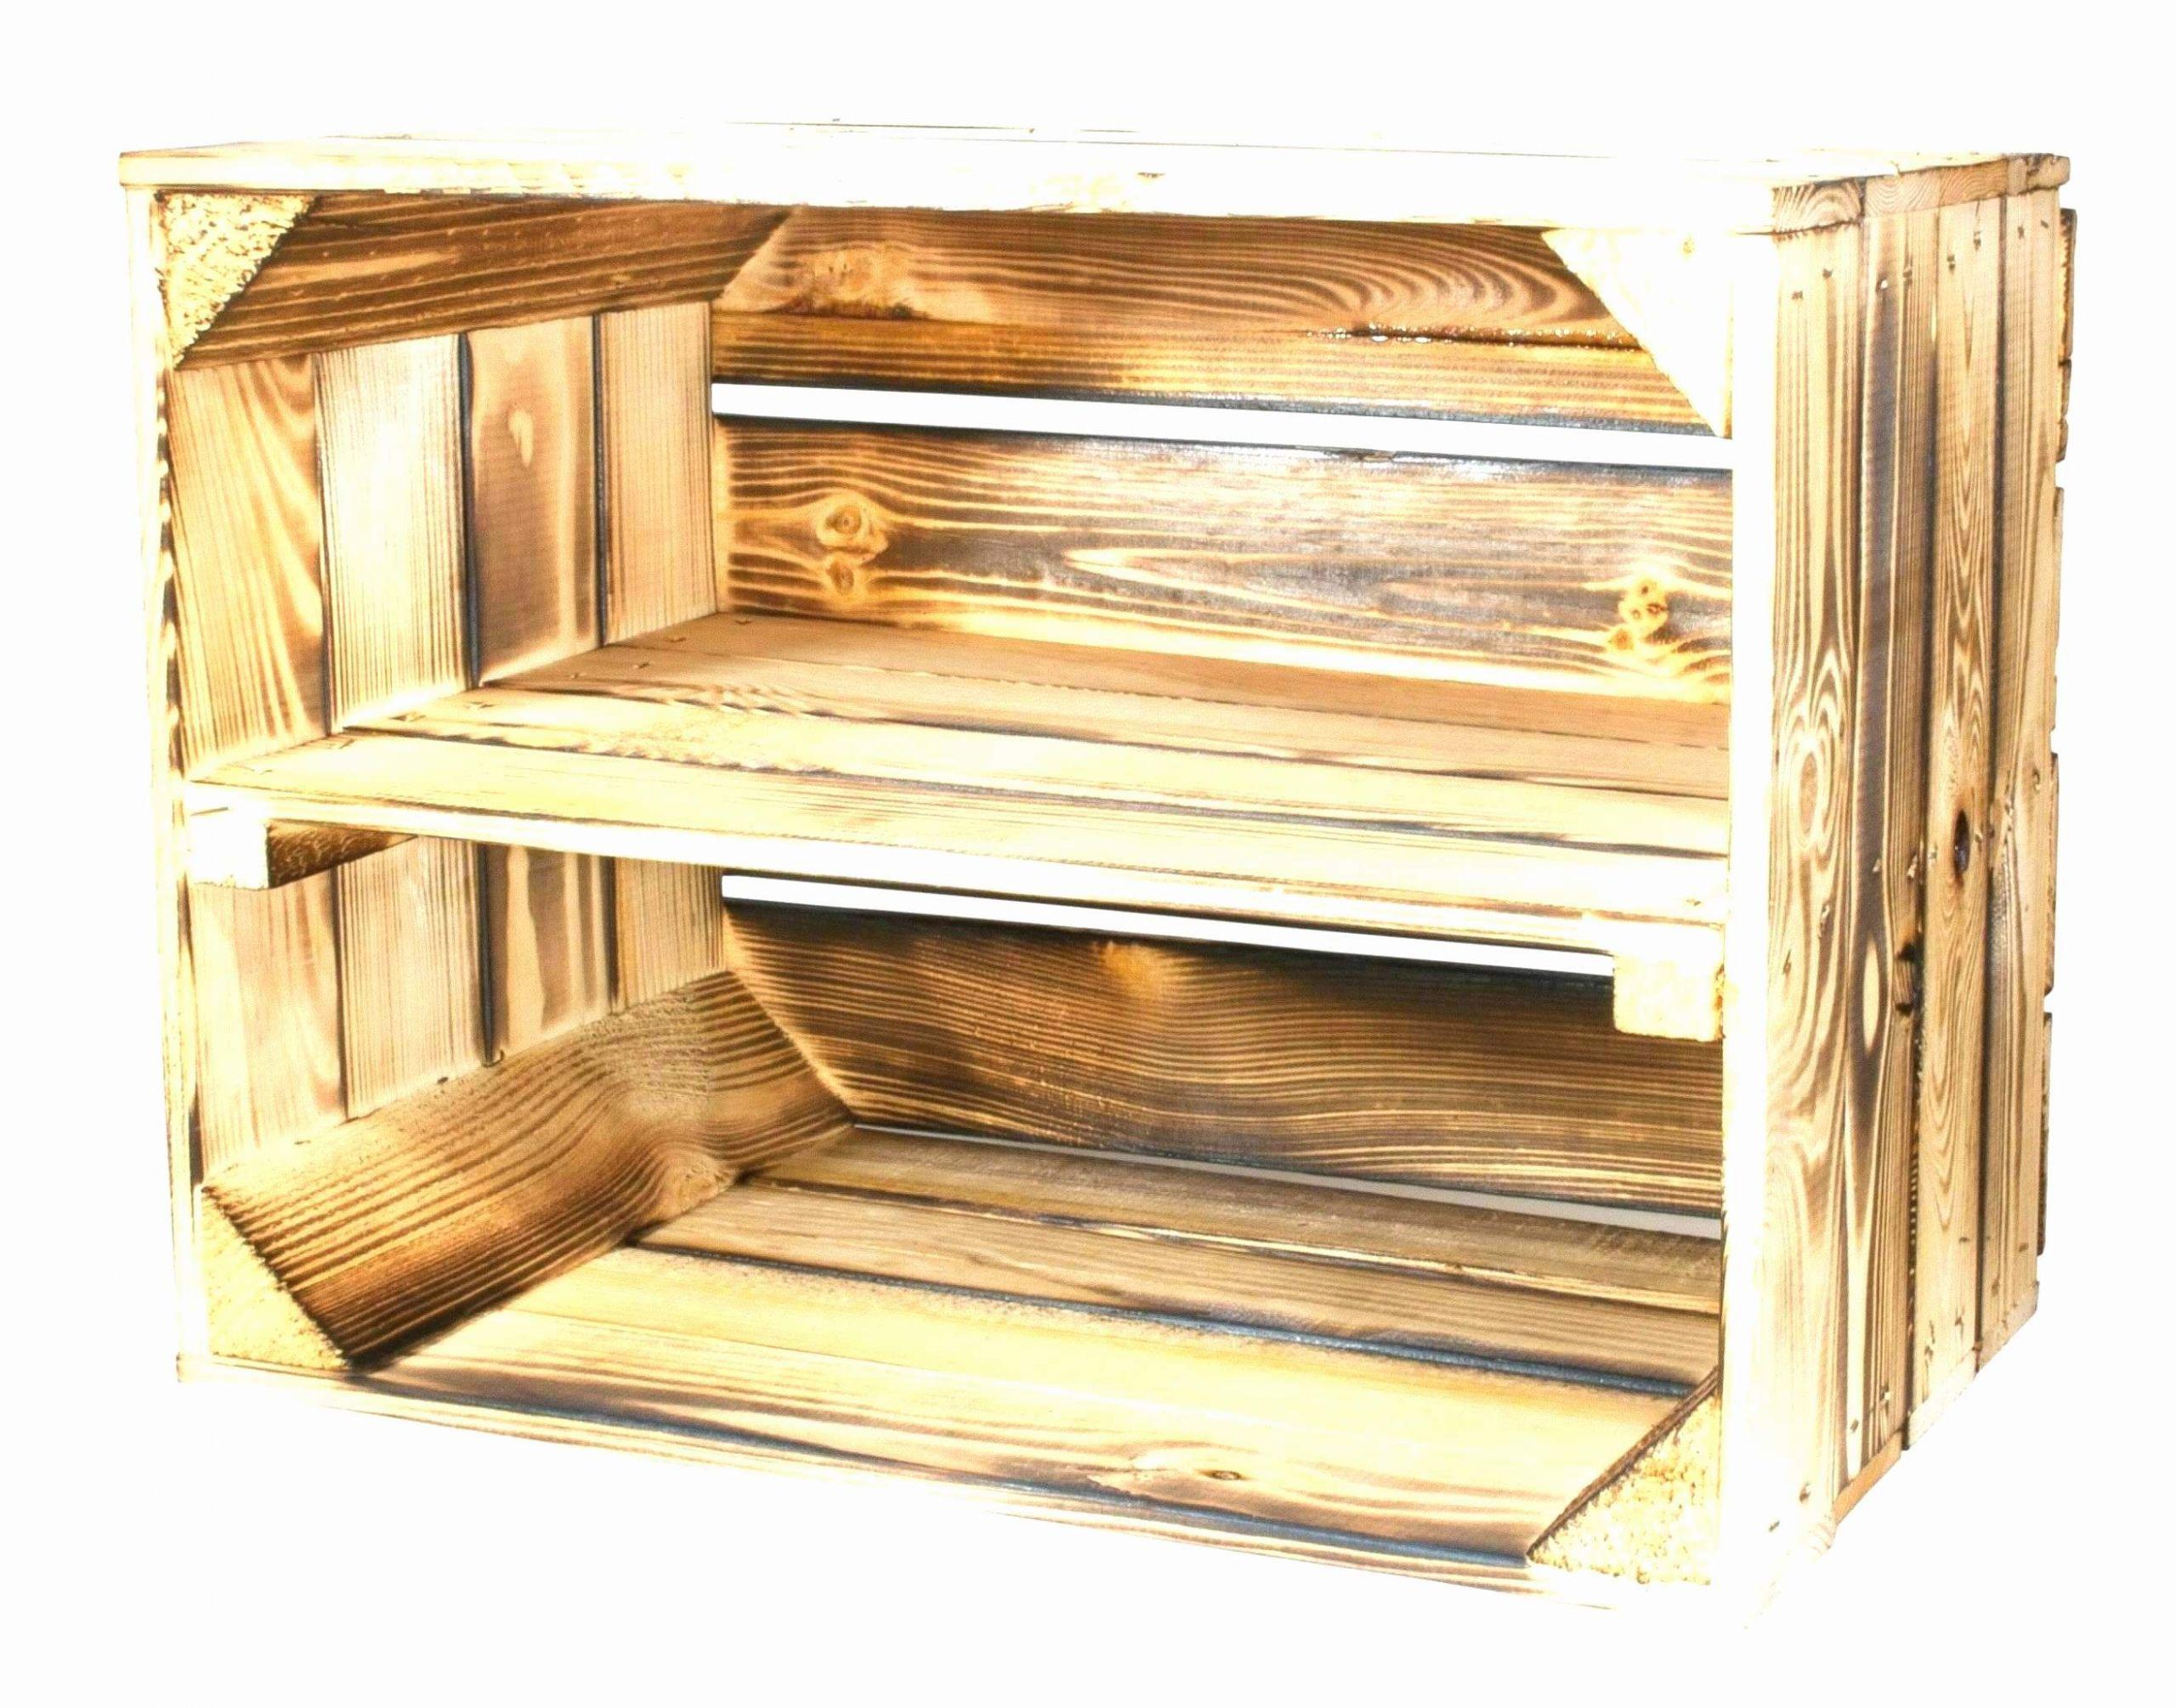 palettenregal selber bauen schon regal multiplex 0d archives design ideen von regale zum selber bauen of palettenregal selber bauen